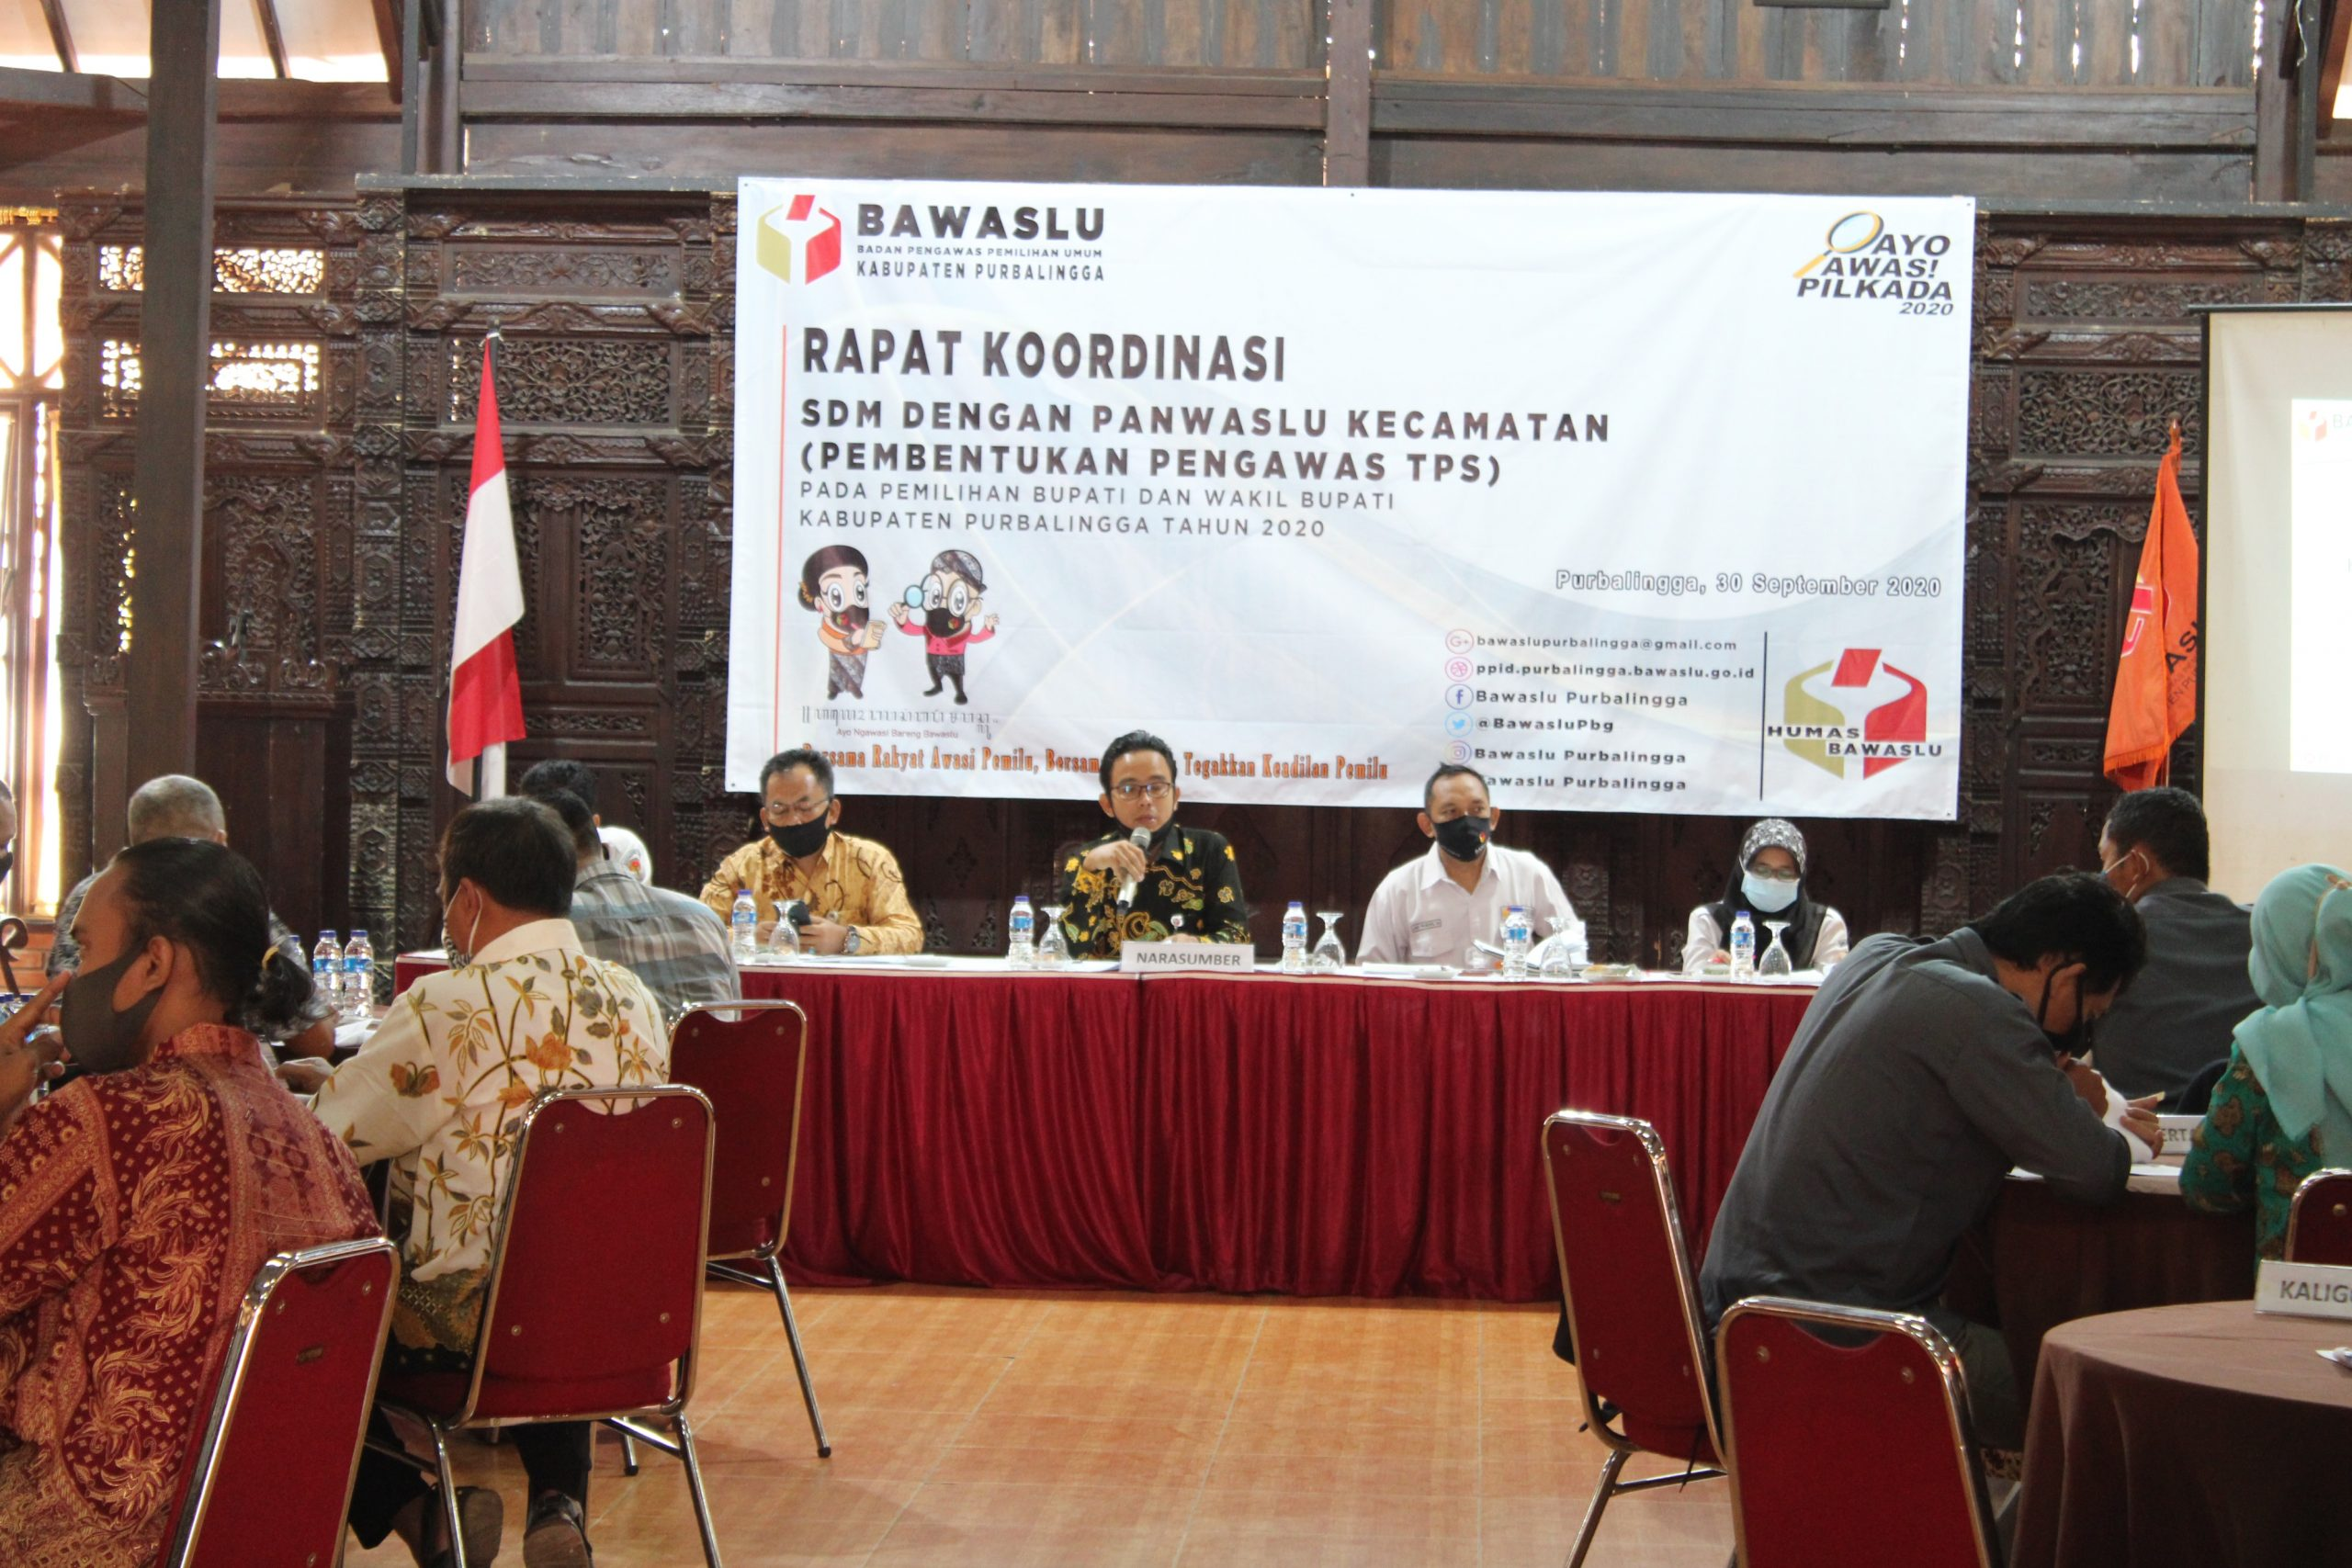 Bawaslu Kabupaten Purbalingga adakan Rakor Pembentukan Adhoc PTPS